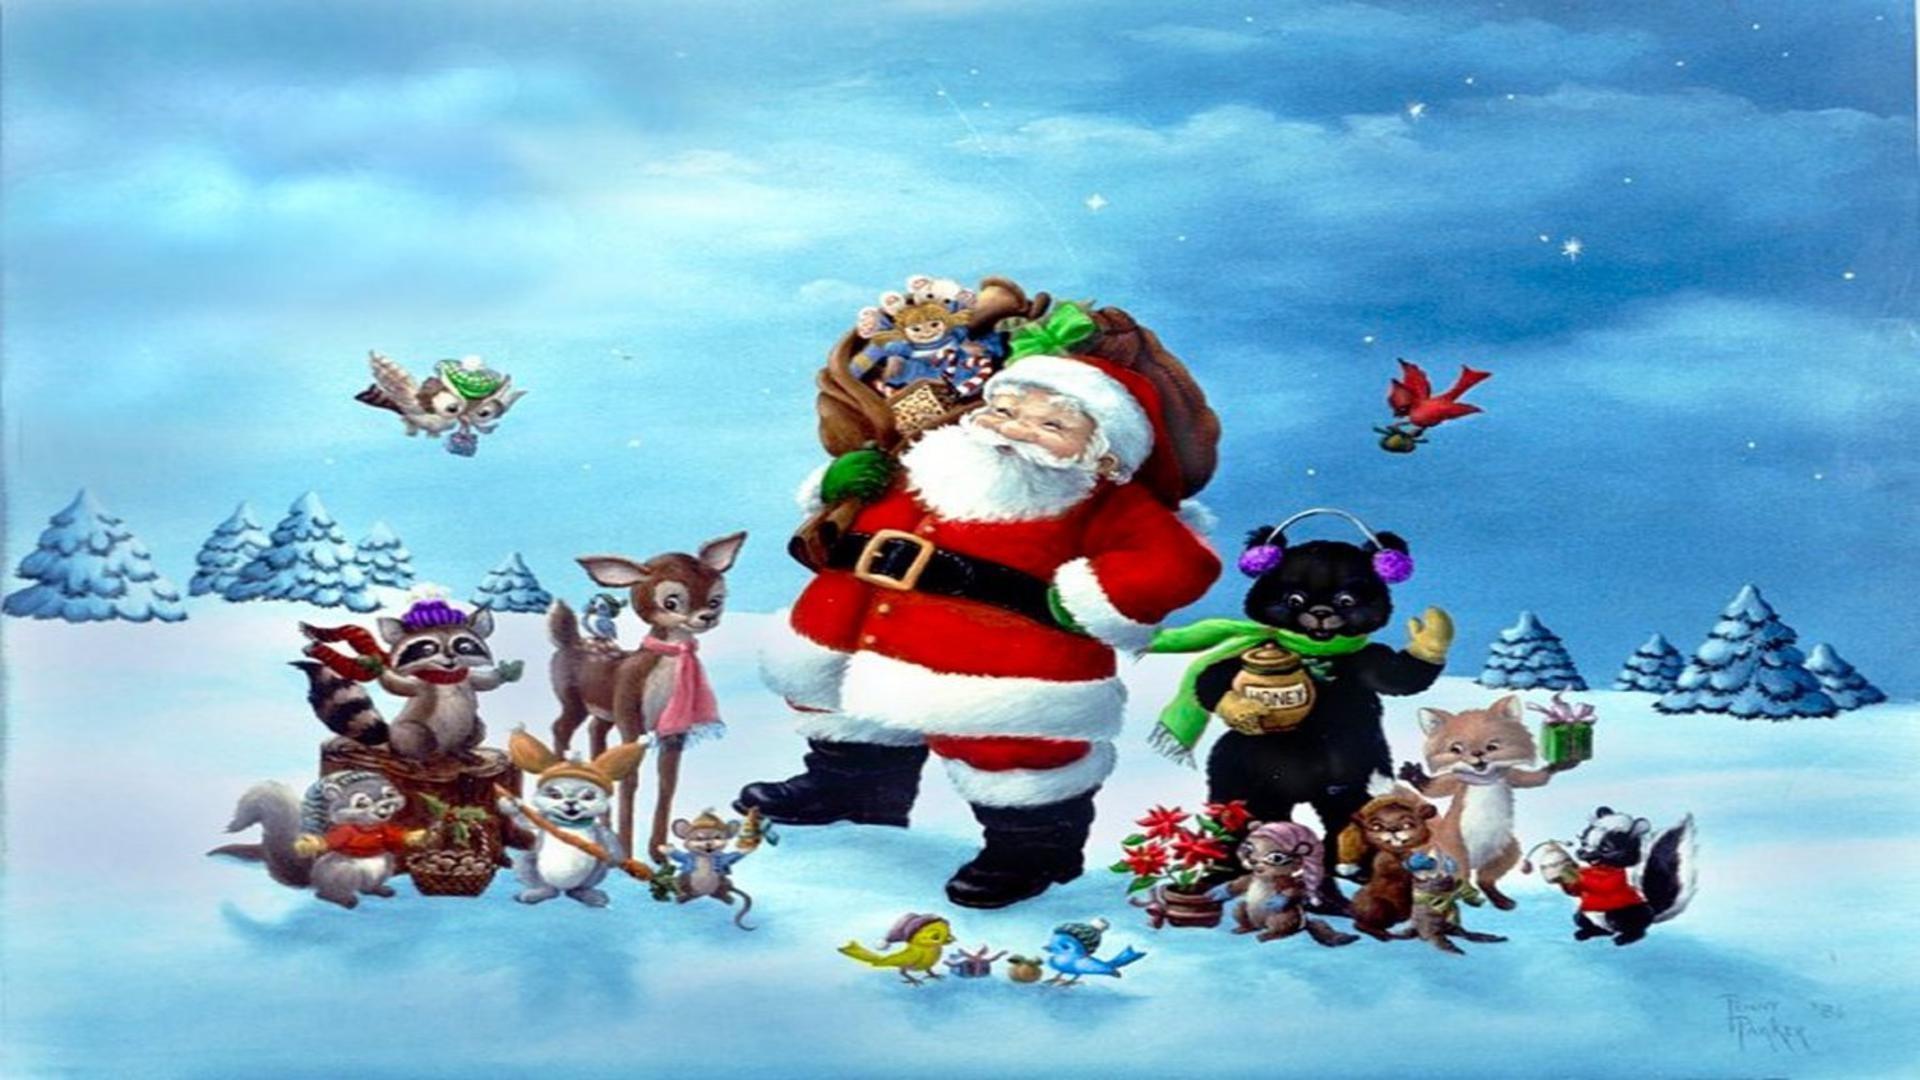 Tags:Christmas HD Wallpapers · desktop wallpapers · hd wallpapers · hq hd  wallpapers · linux wallpapers · Merry Christmas 2012 HD wallpapers ·  stunning hd …